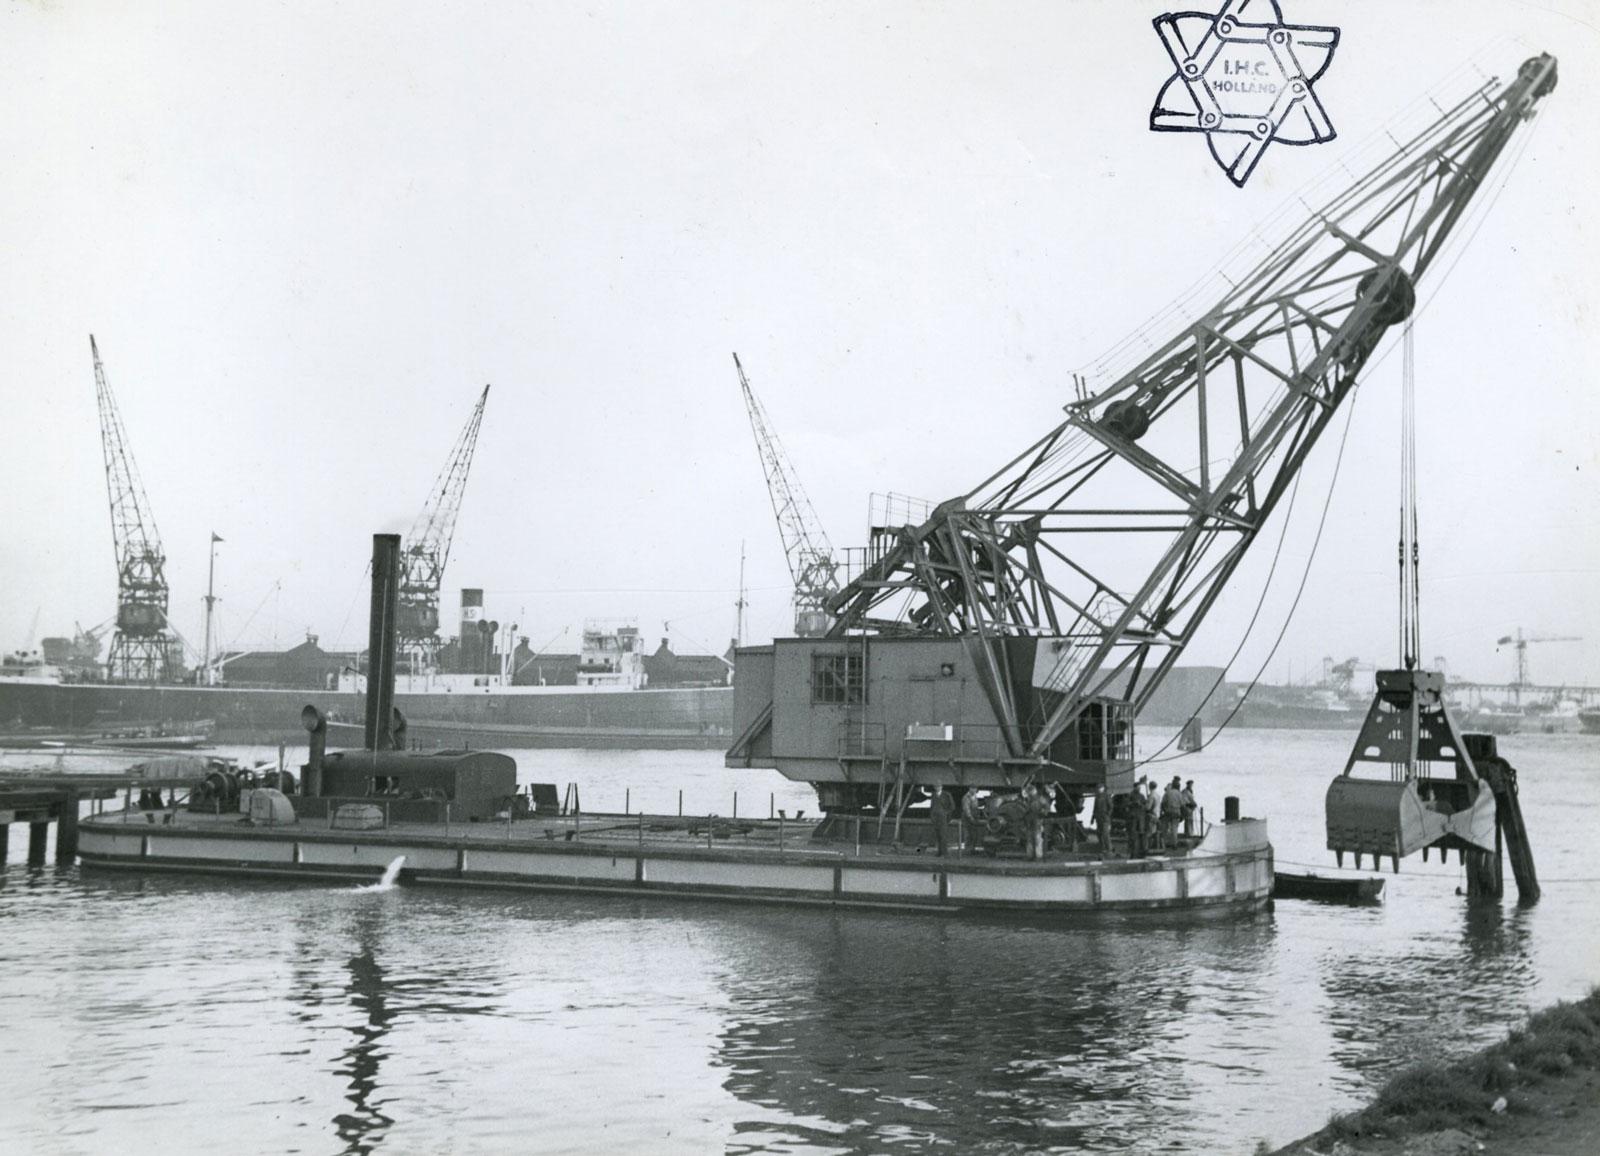 Bnr. 949: Arobat (1950)